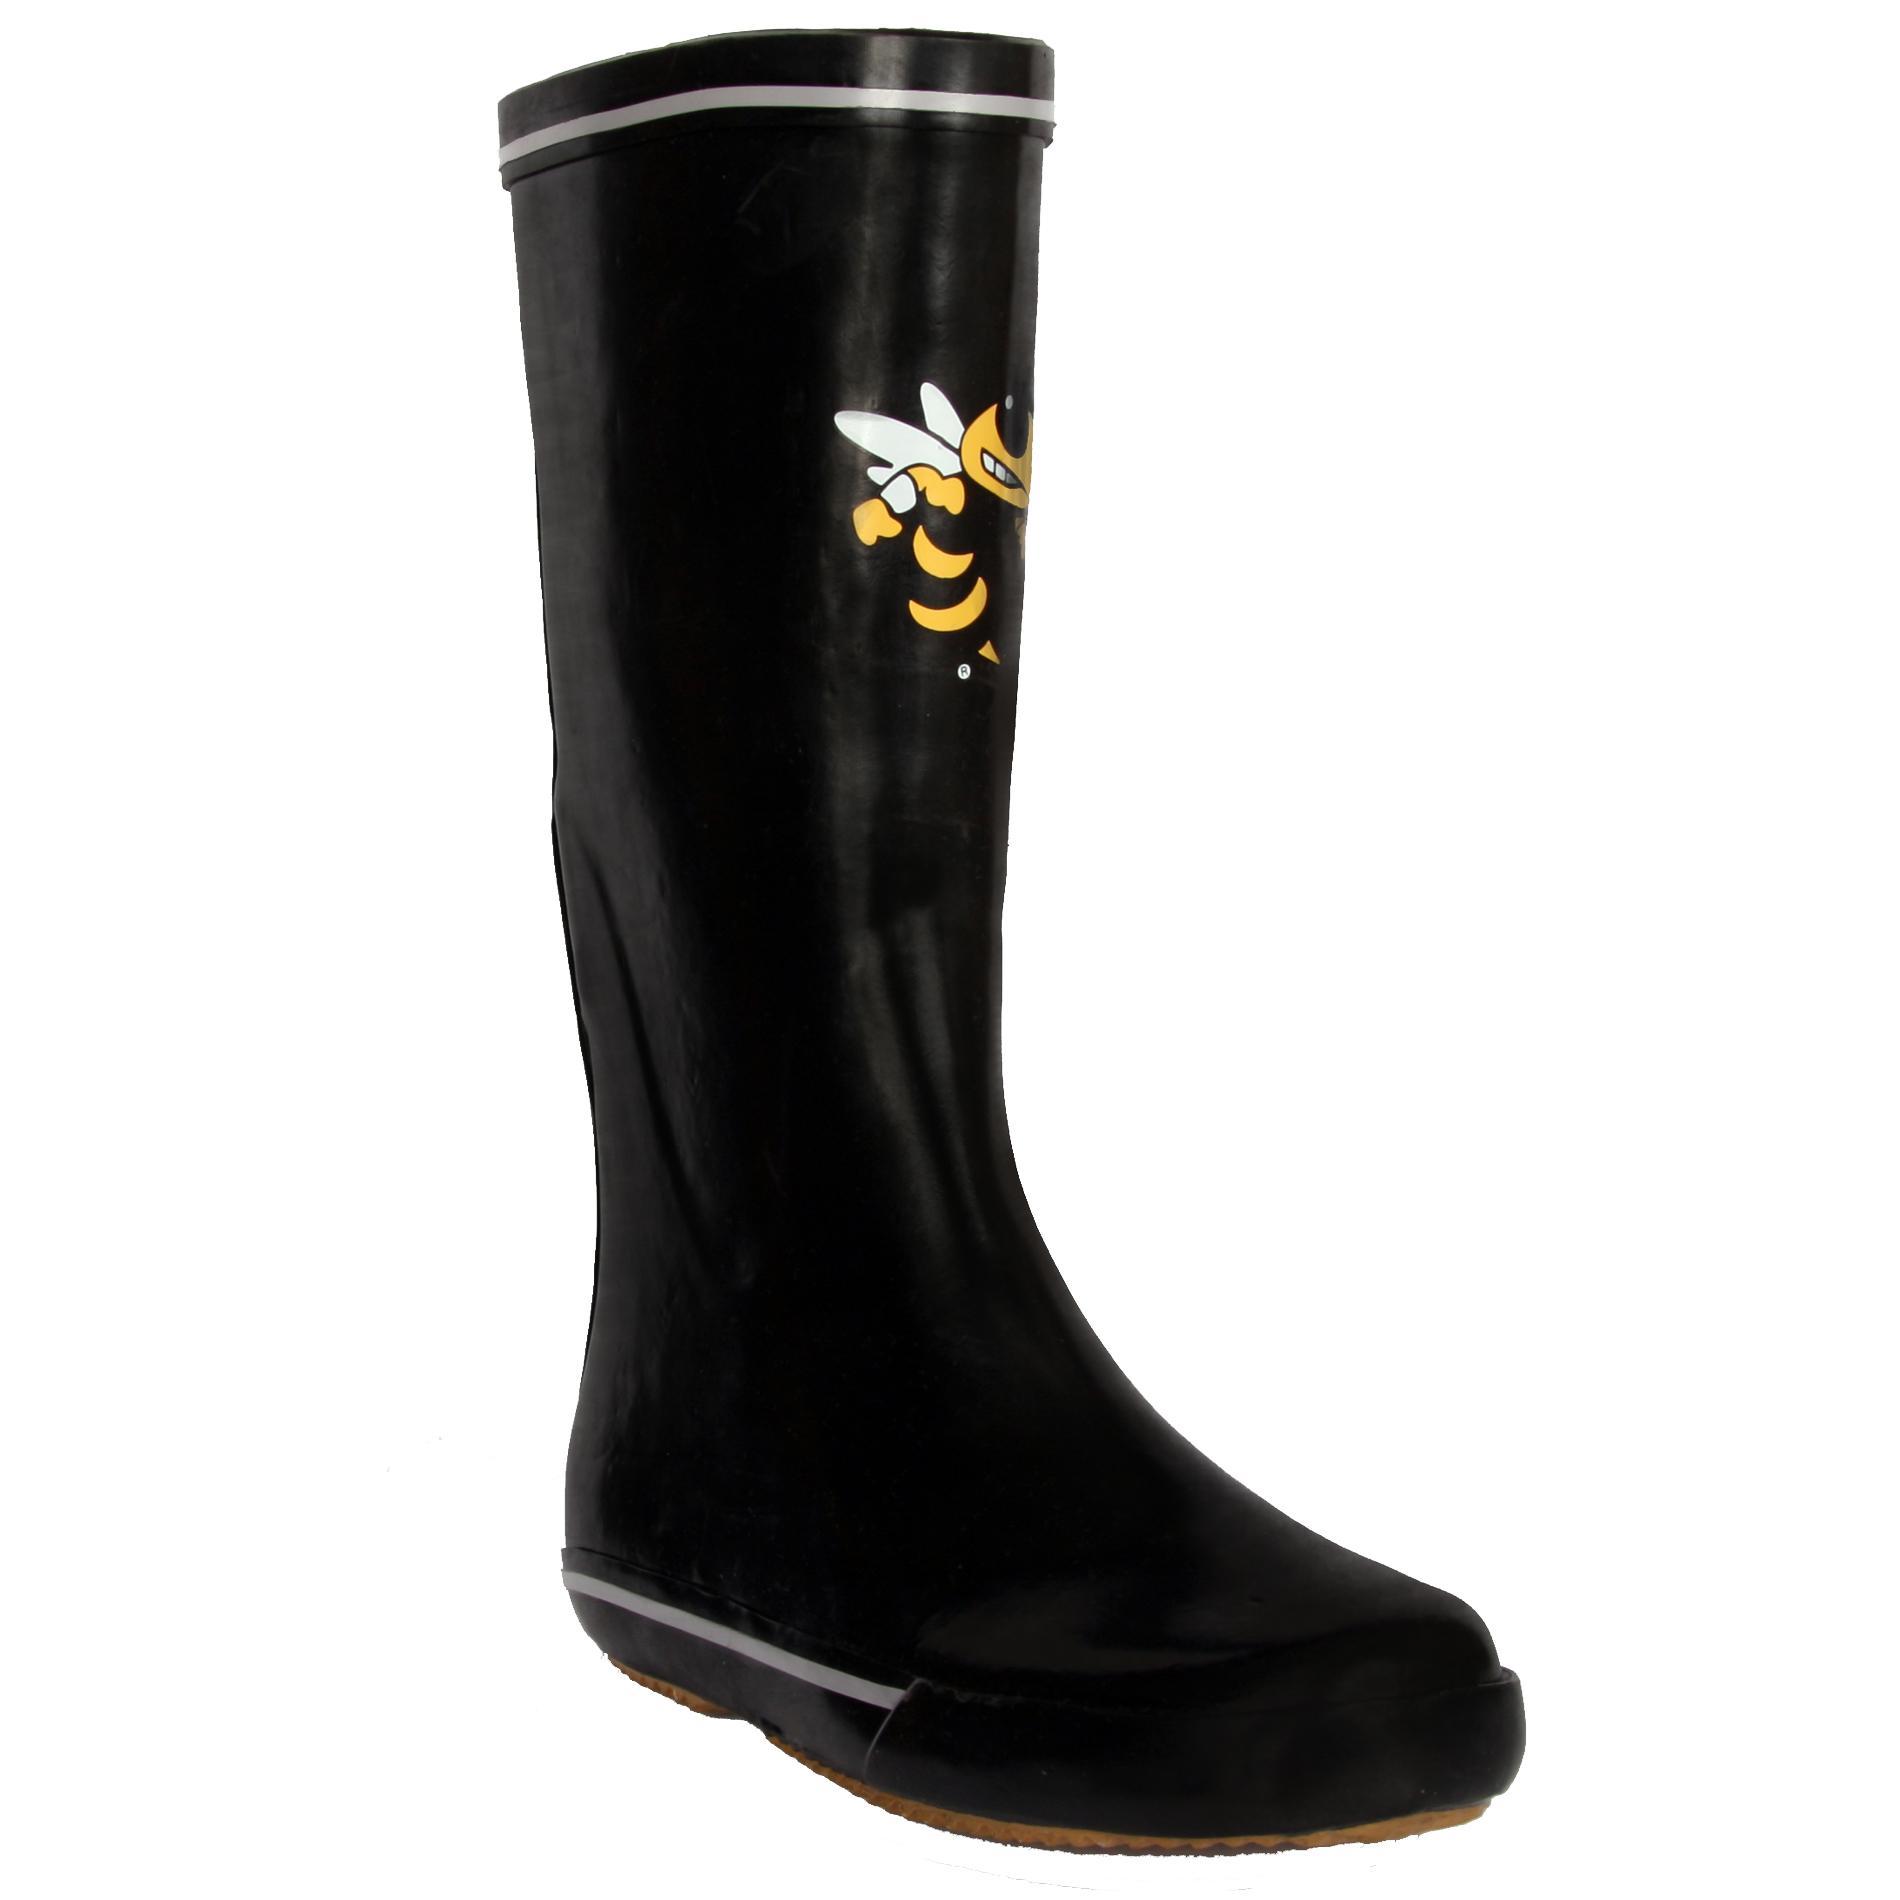 Georgia Tech Yellow Jacket Women's Centered Logo Rain Boots